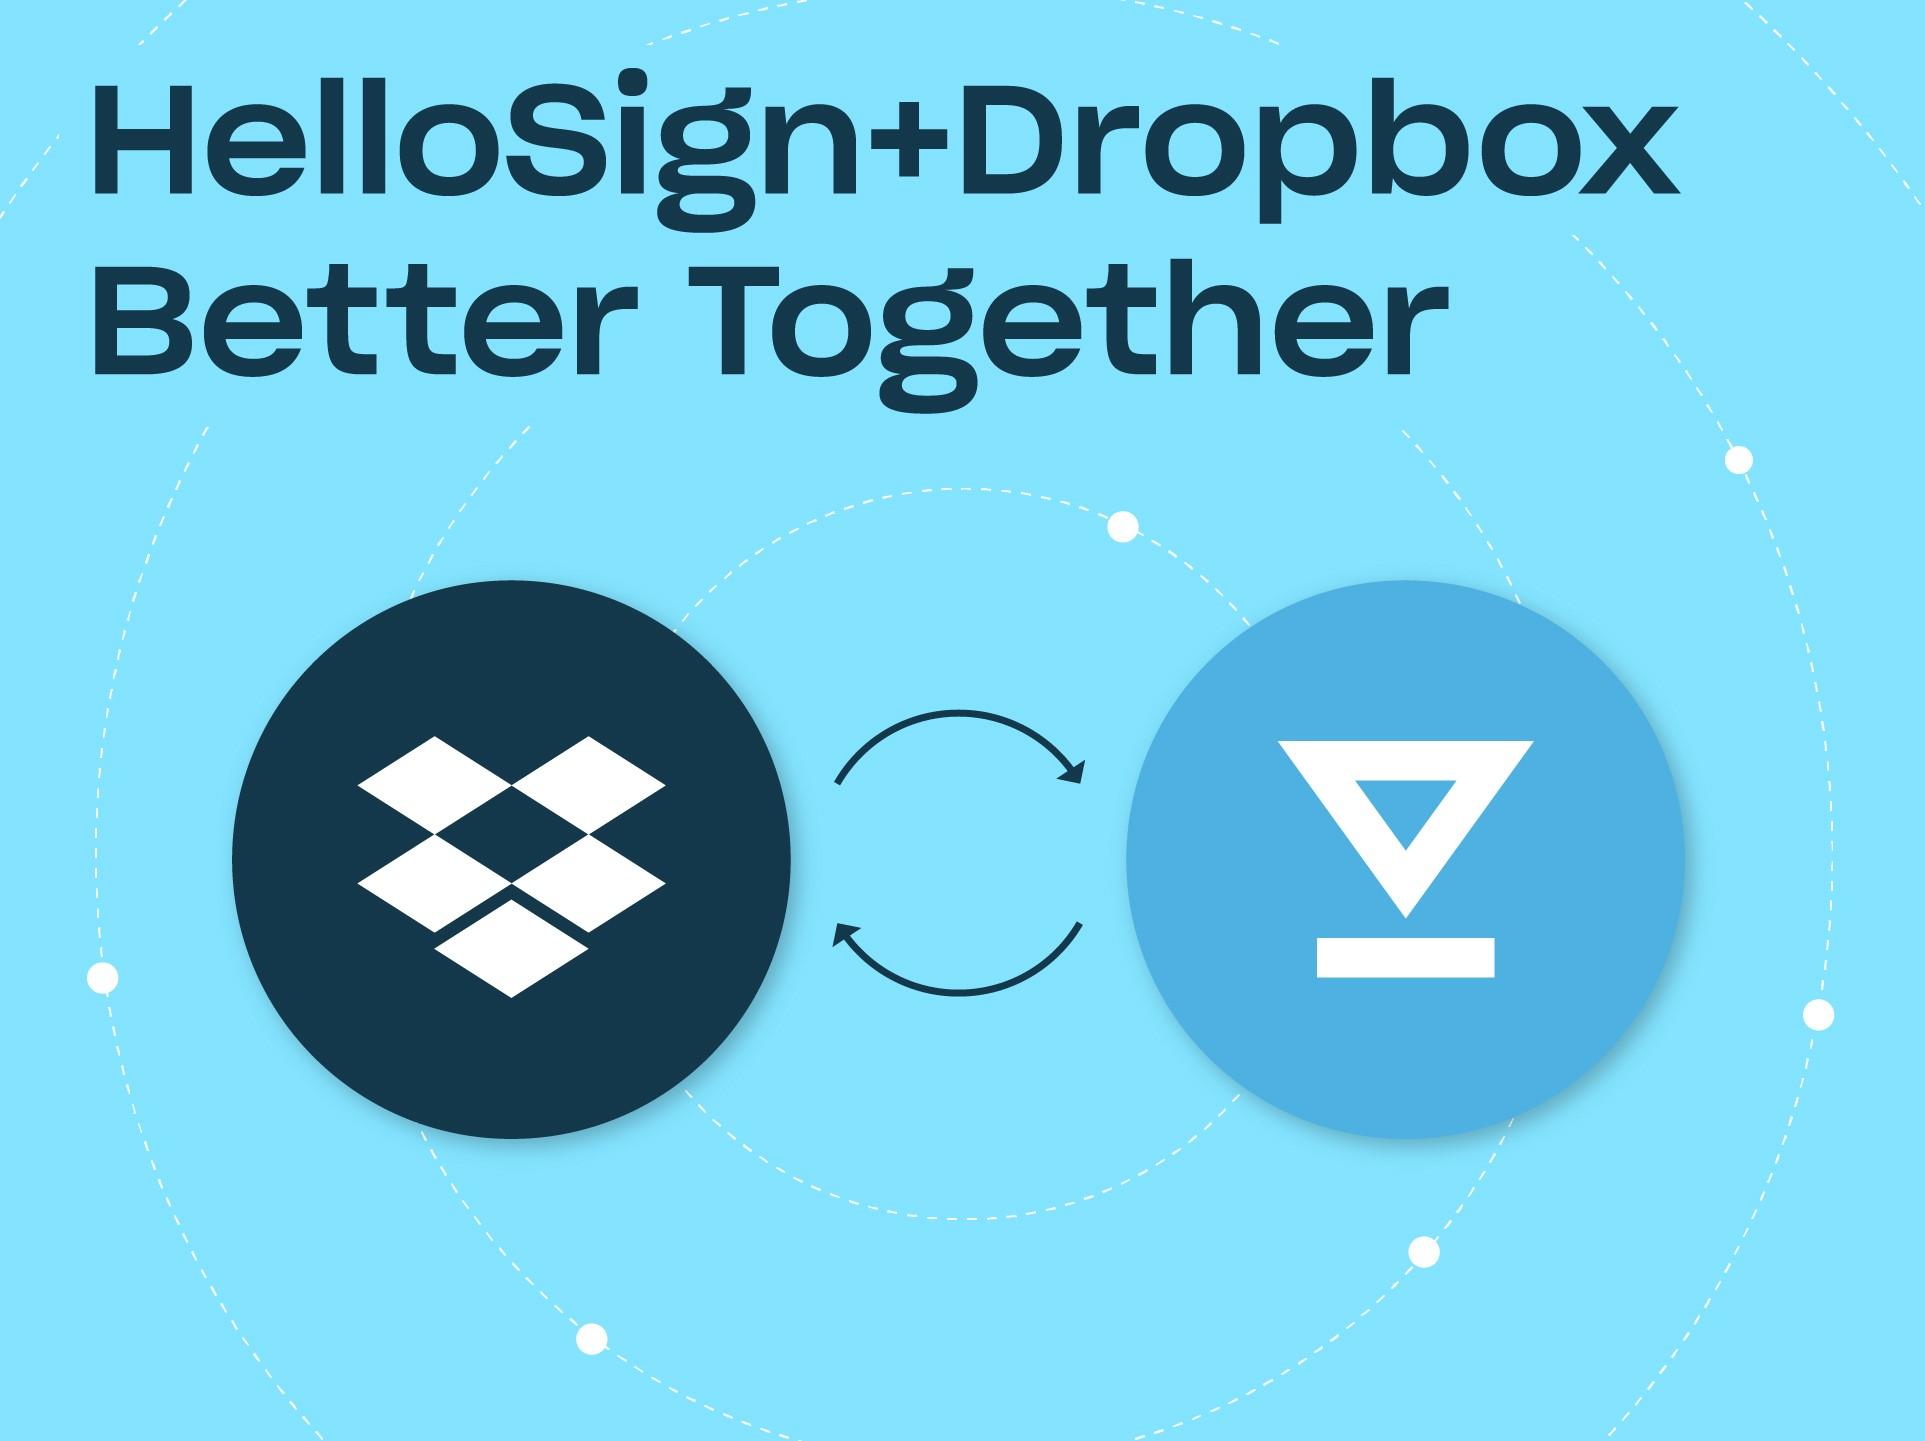 HelloSign + Dropbox ウェビナー